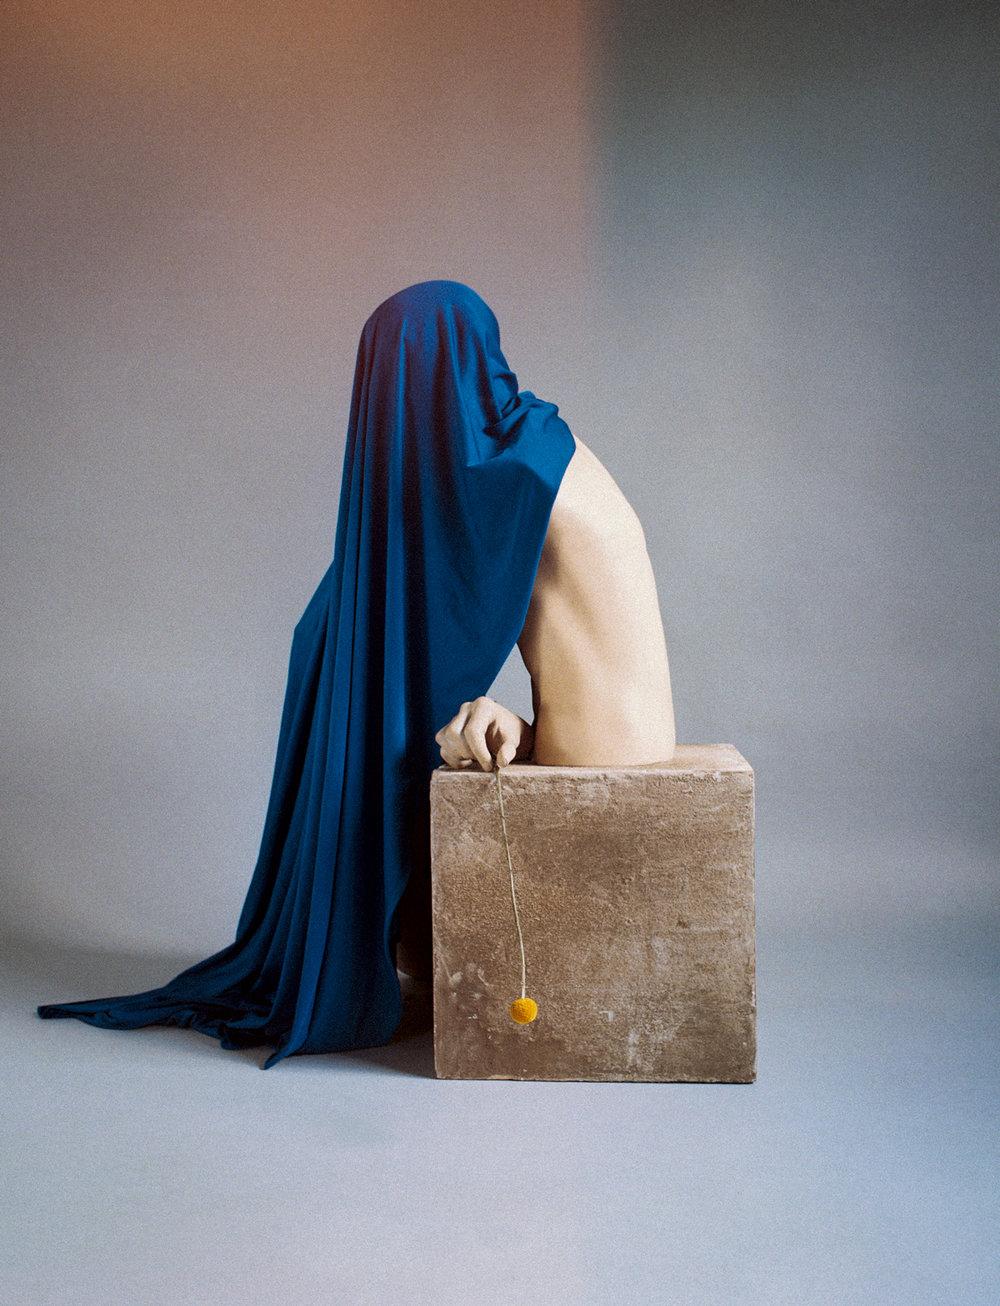 julien_capelle_nature_morte_mannequin_tissue_bleu_bloc_beton.jpg